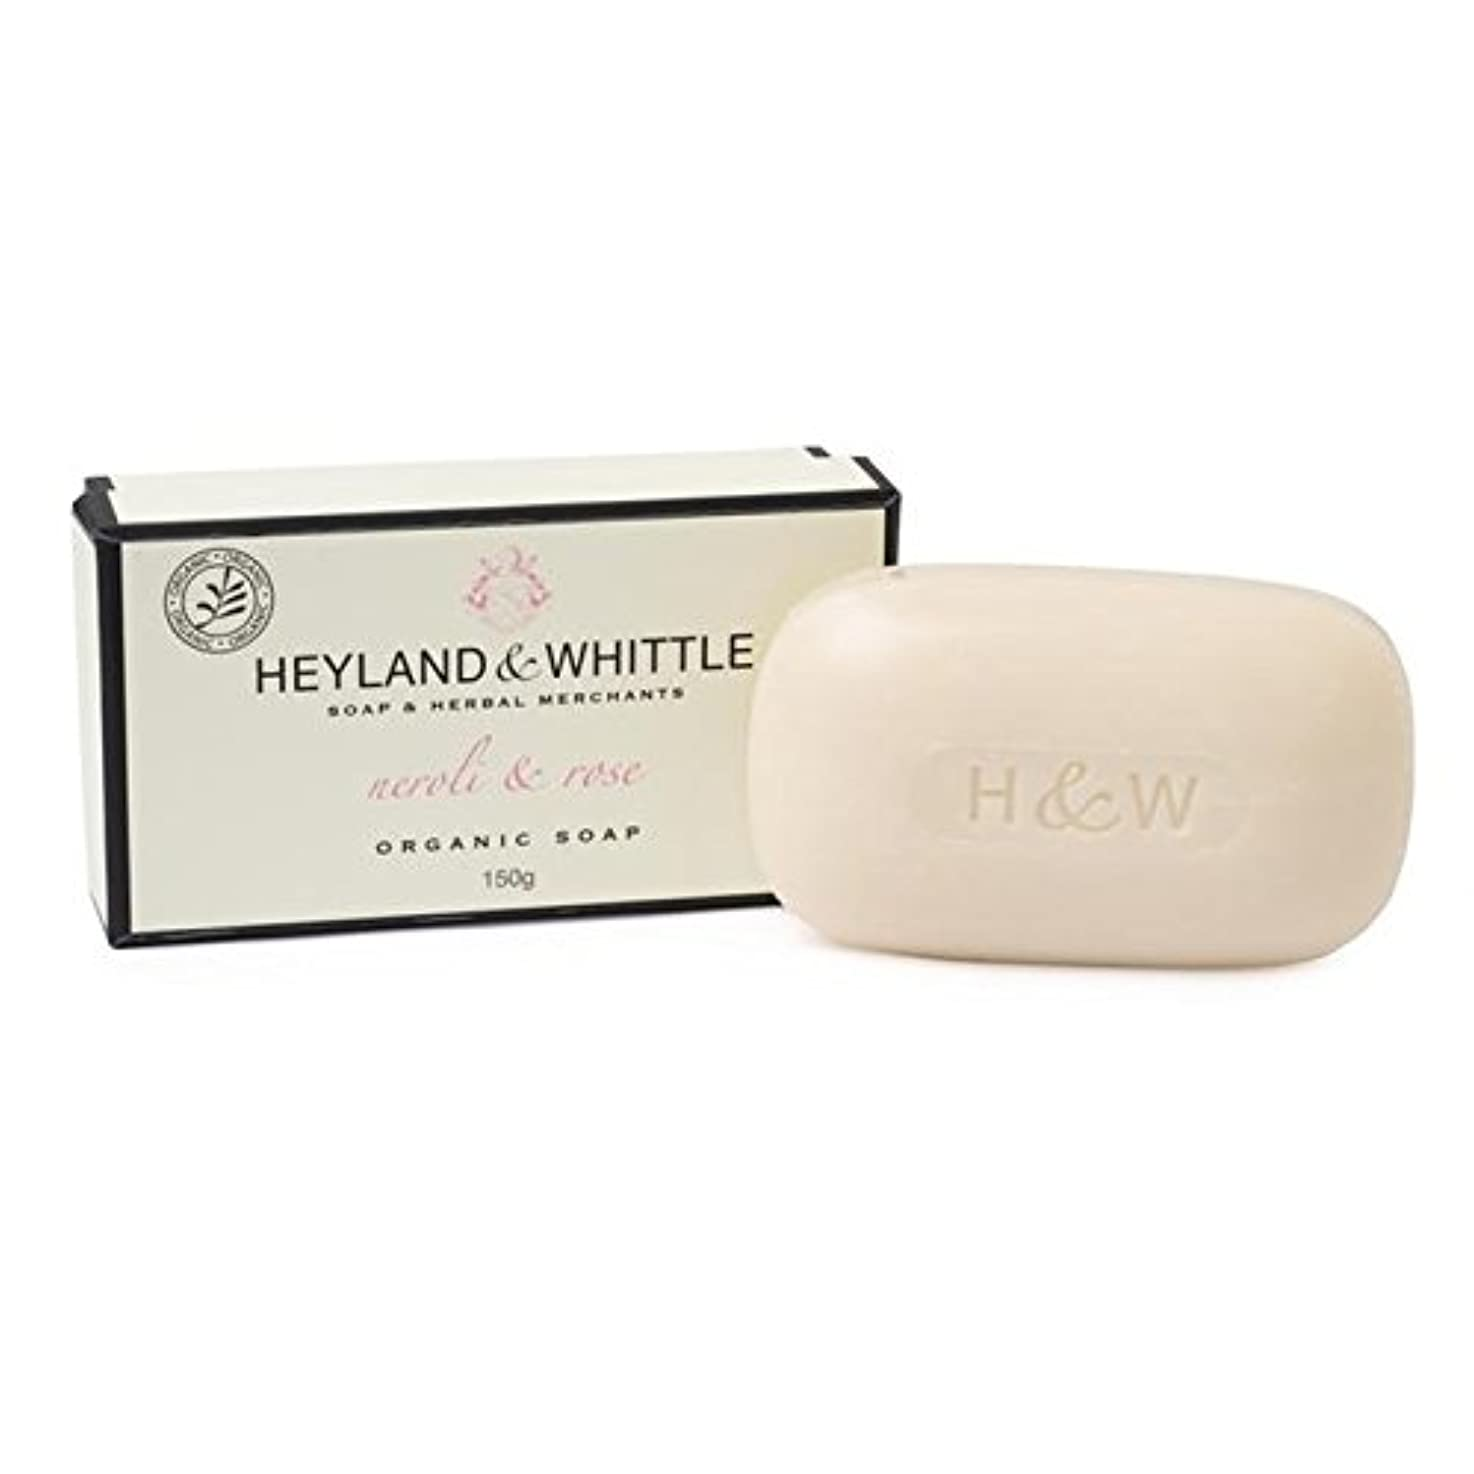 Heyland & Whittle Organic Neroli & Rose Soap Bar 150g - &削る有機ネロリ&ソープバー150グラムをバラ [並行輸入品]